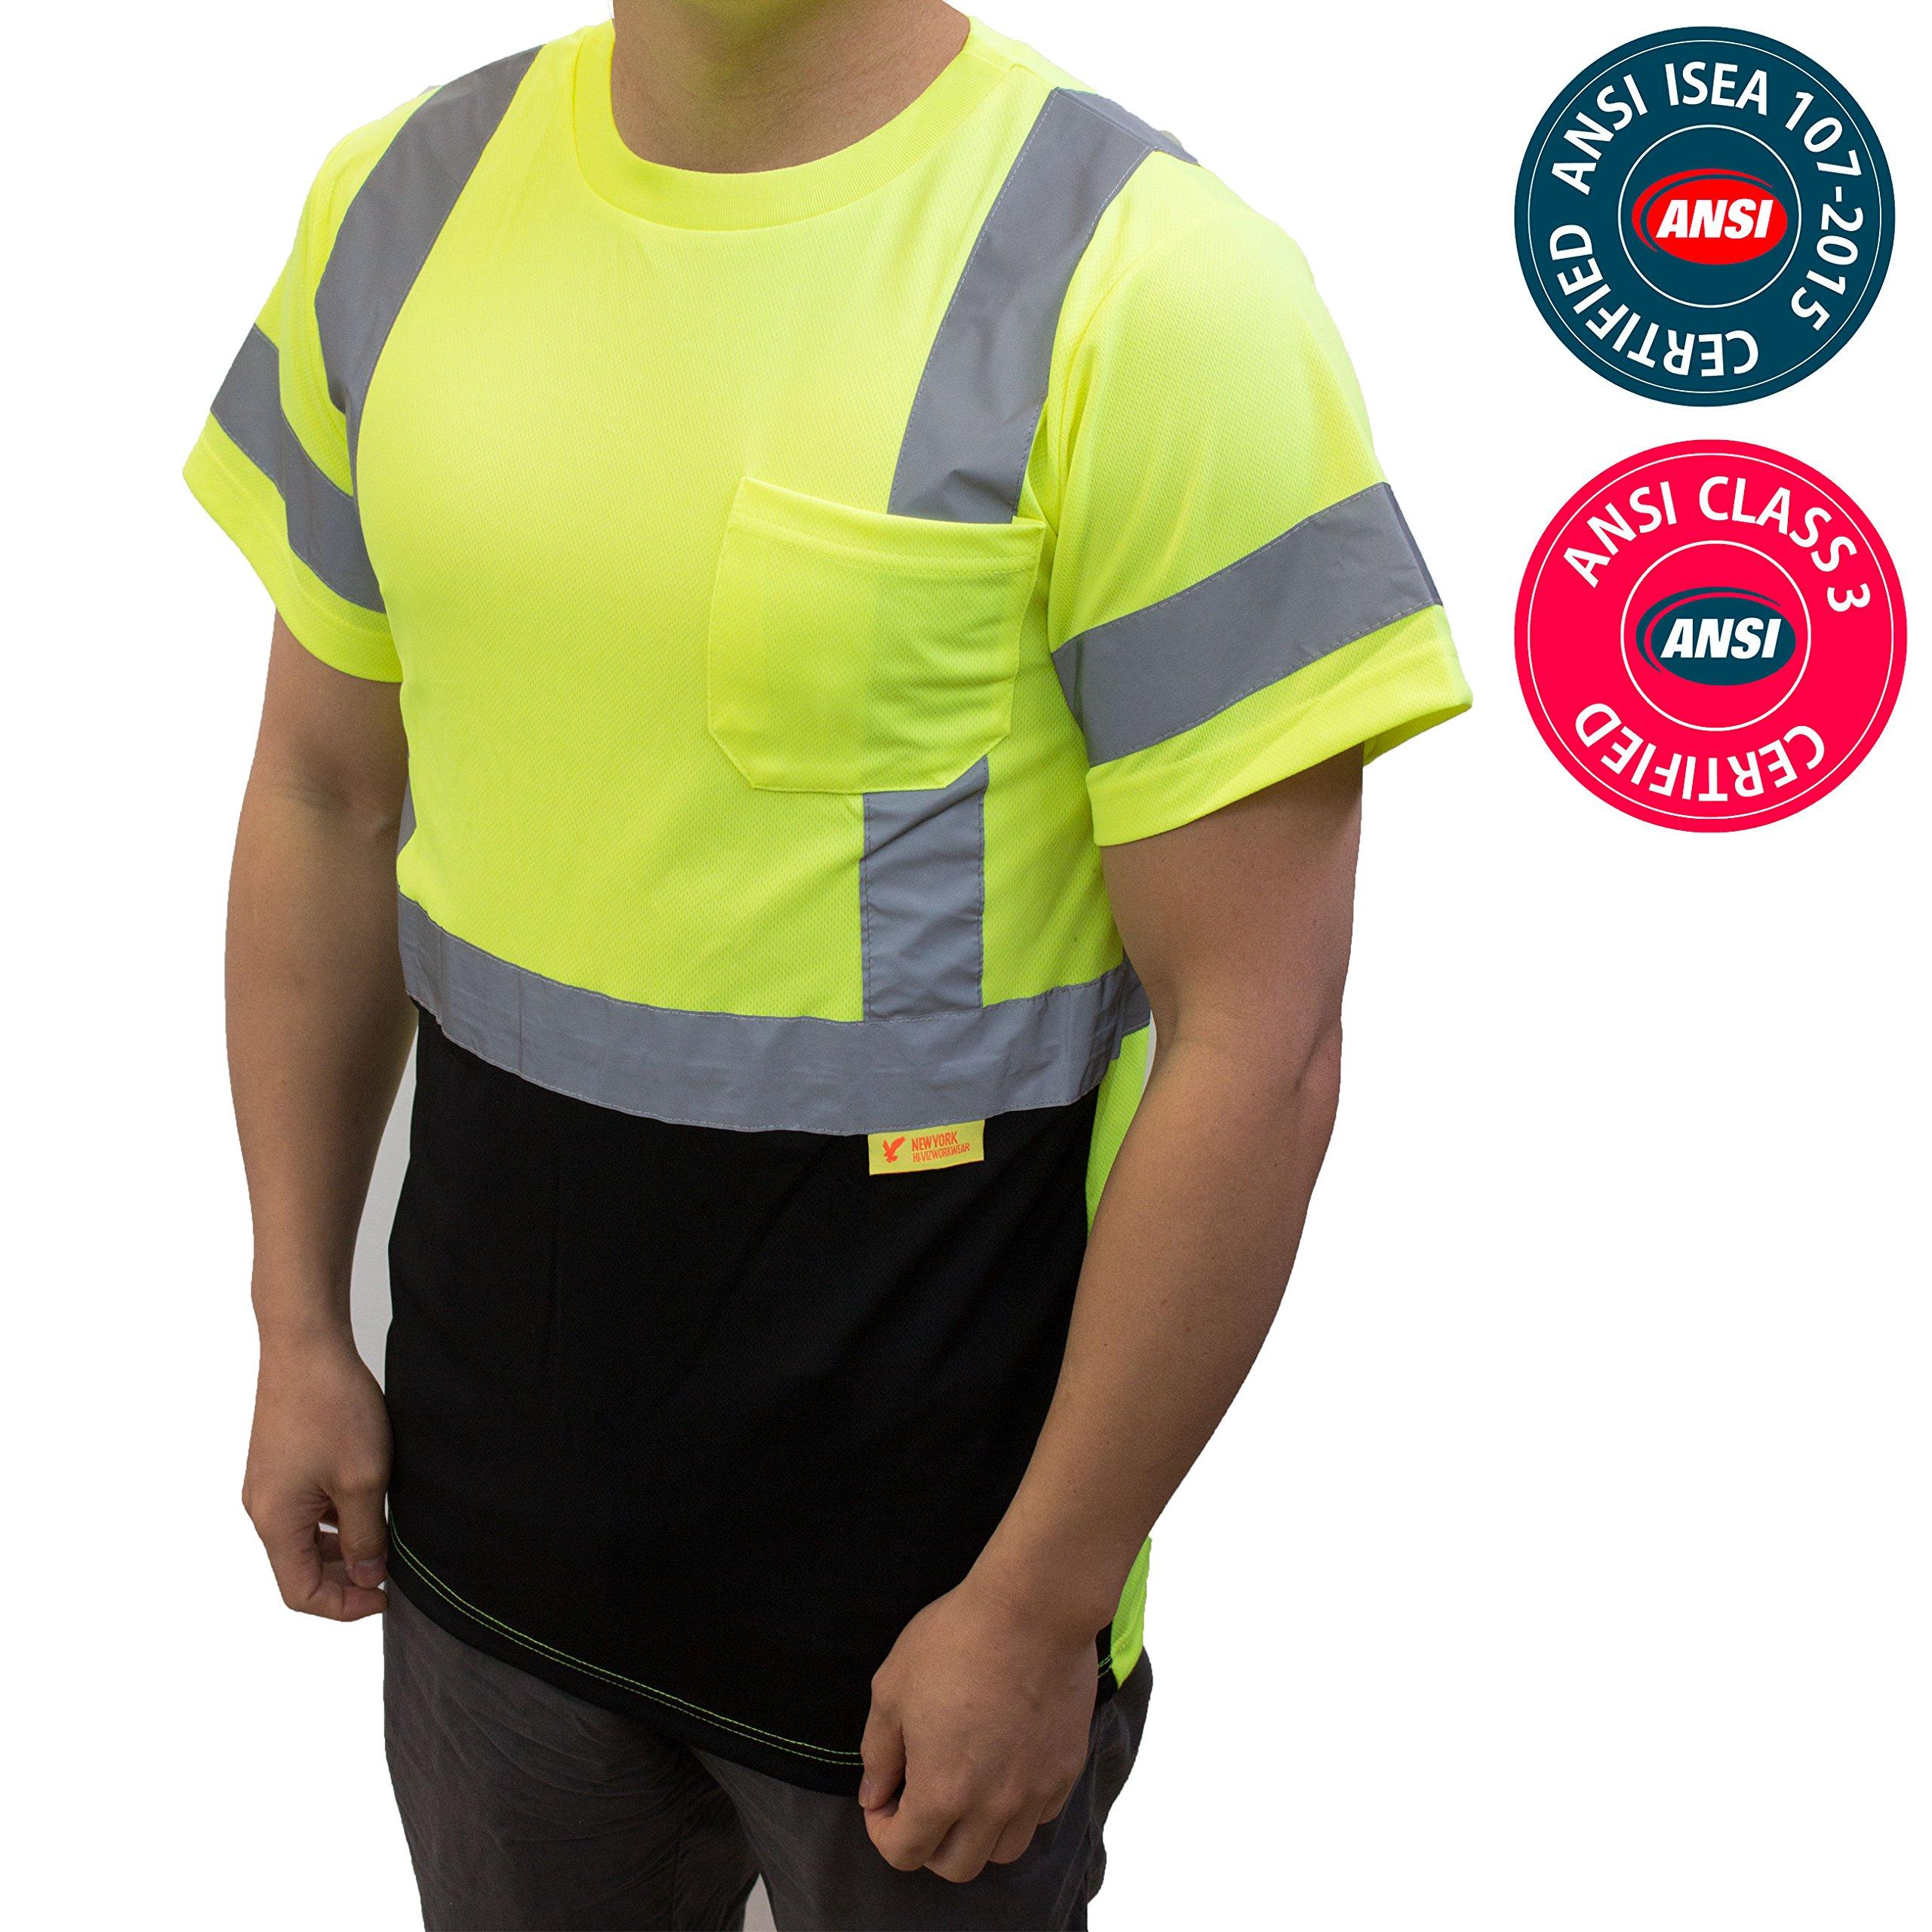 NY BFS8512 High-Visibility Class 3 T Shirt with Moisture Wicking Mesh Birdseye, Black Bottom (Large, Green)